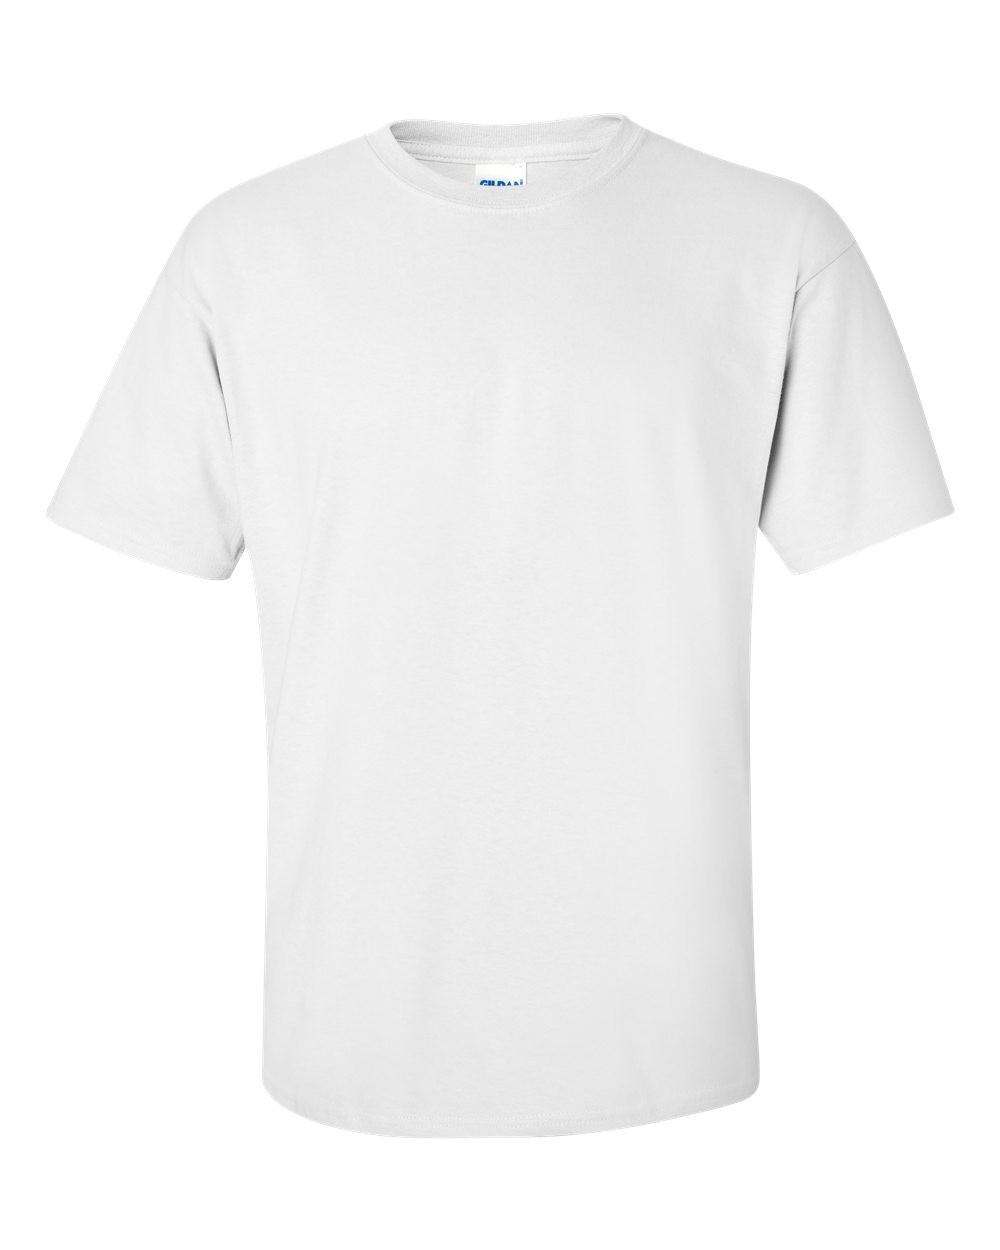 blank white t shirt clipart best